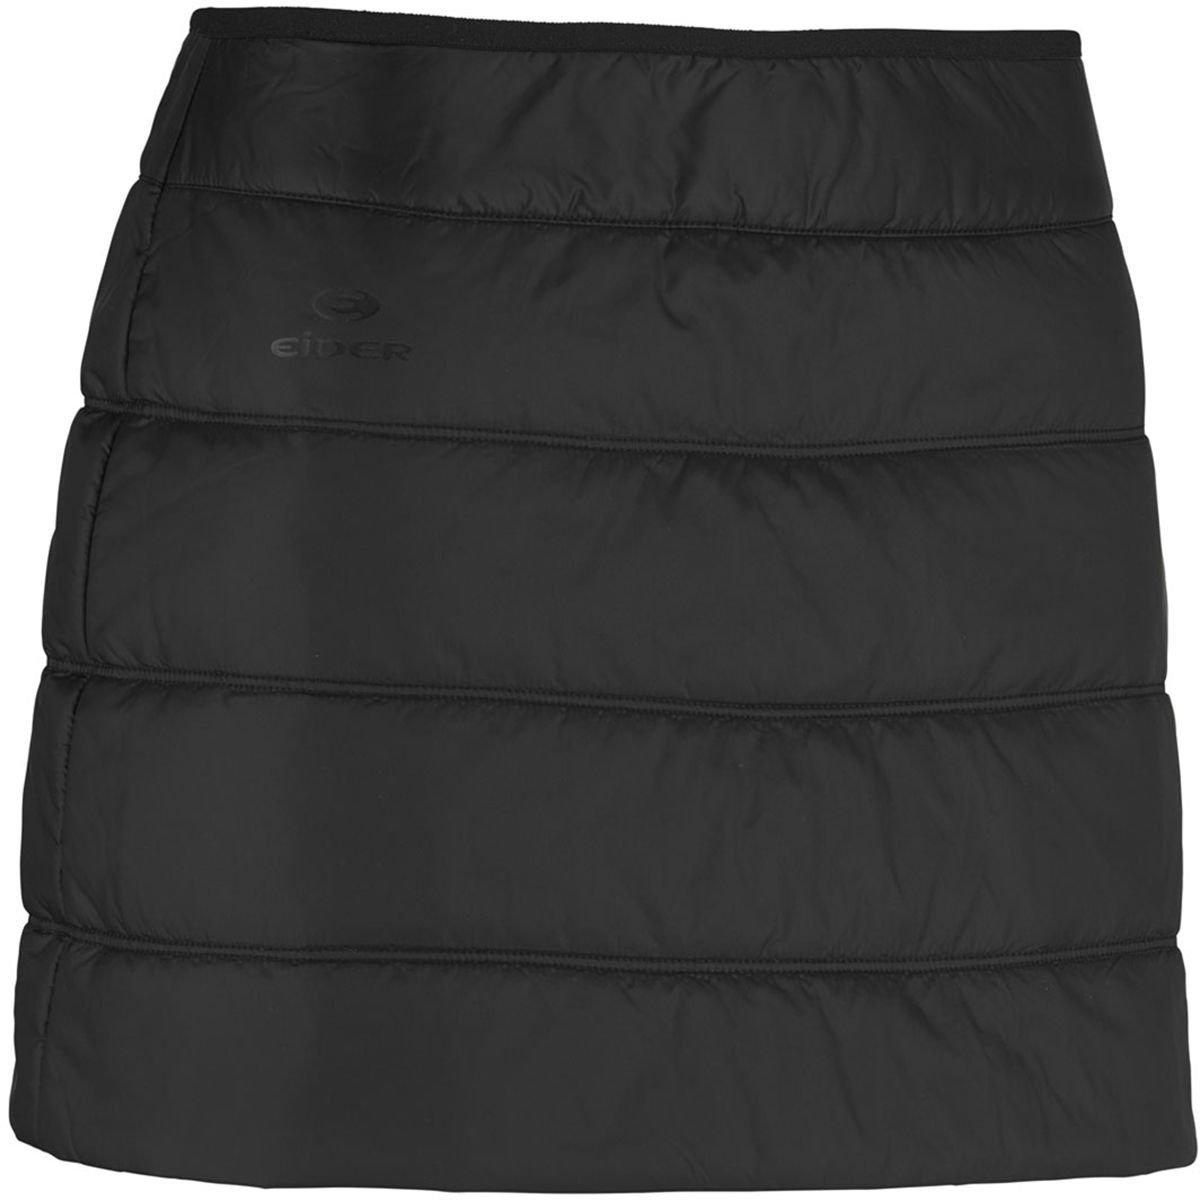 Eider Twin Peaks Skirt - Women's Black, 10